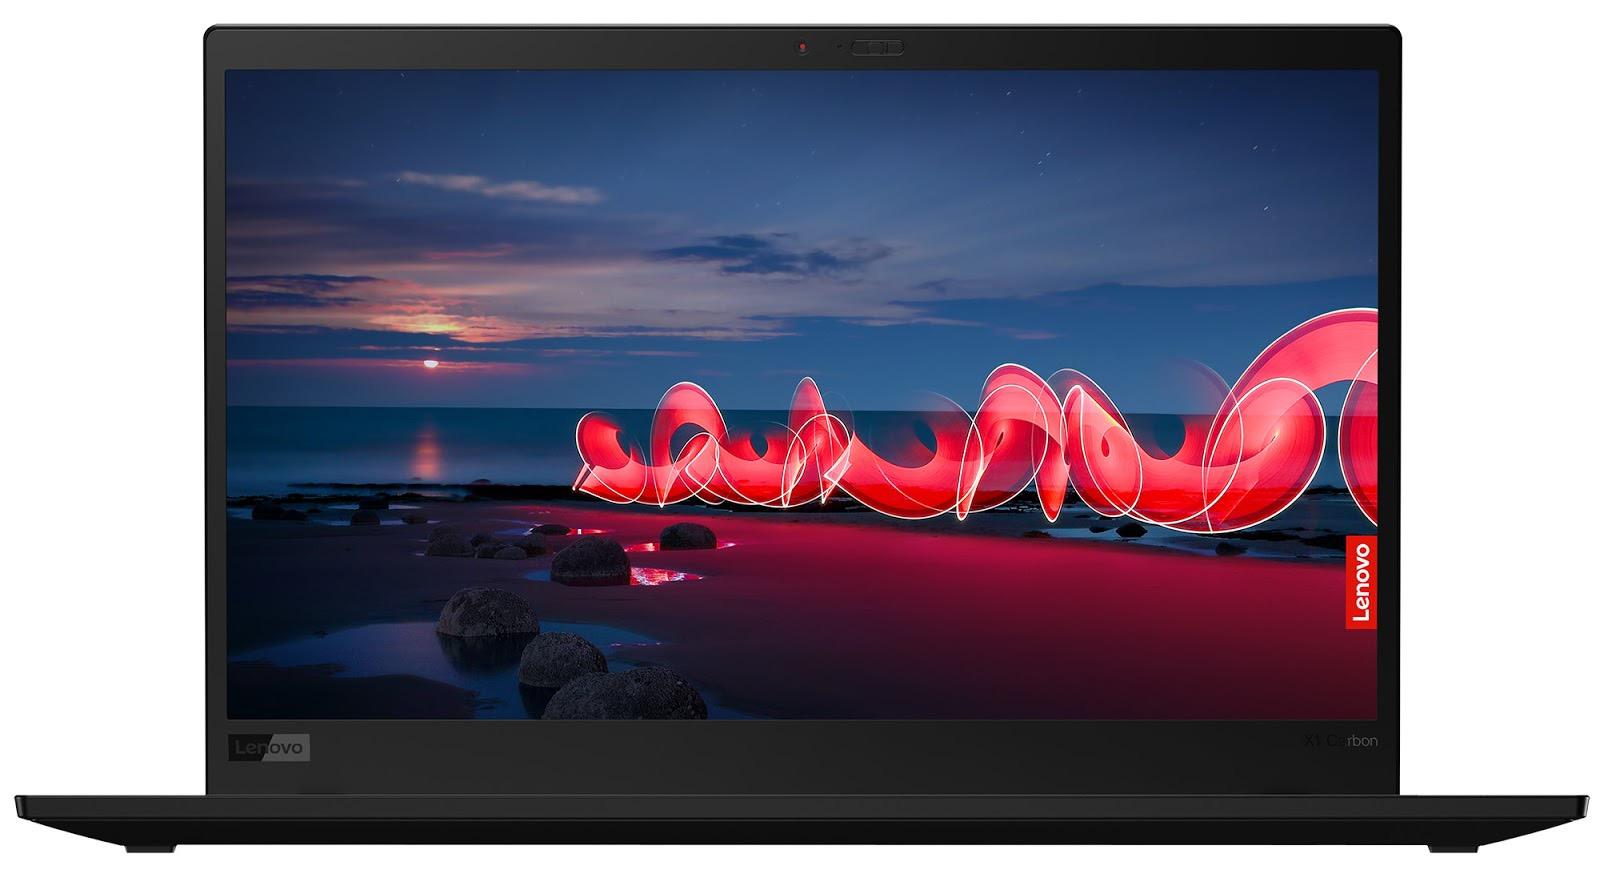 Фото 4. Ноутбук Lenovo ThinkPad X1 Carbon Gen 8 Black (20U9004PRT)